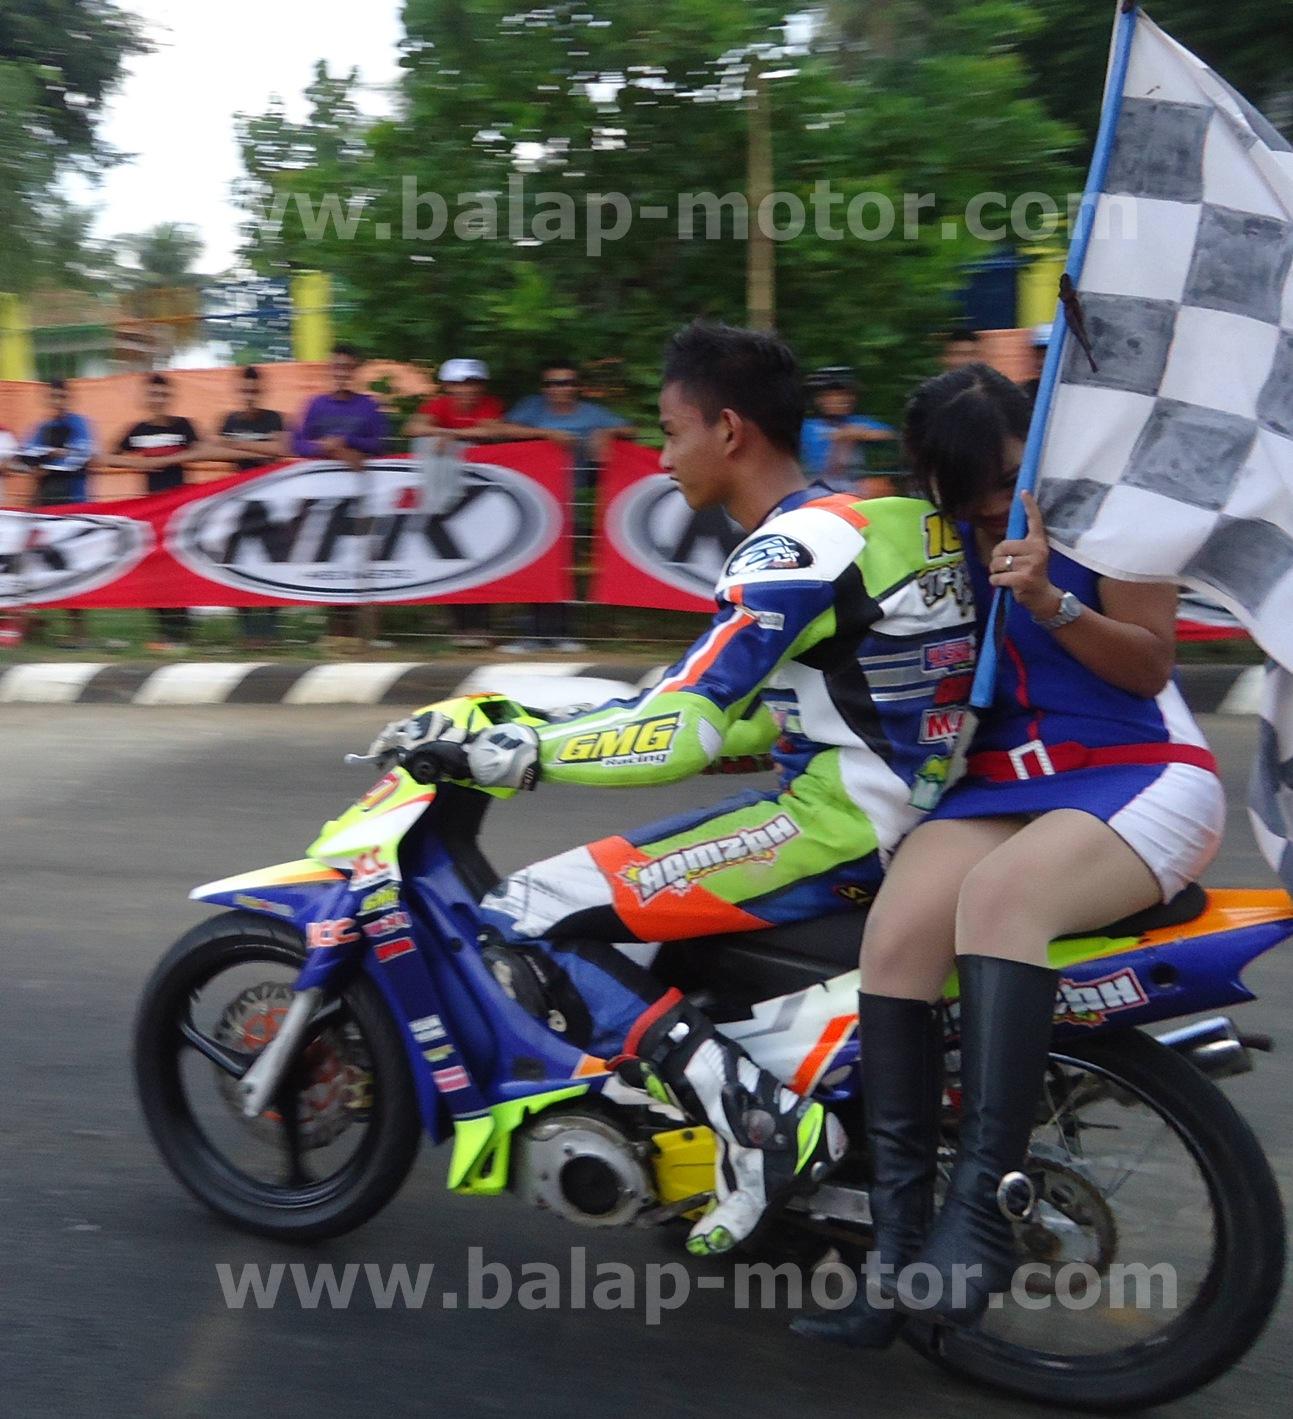 Gambar Motor Balap Road Race Fiz R Galeriotto